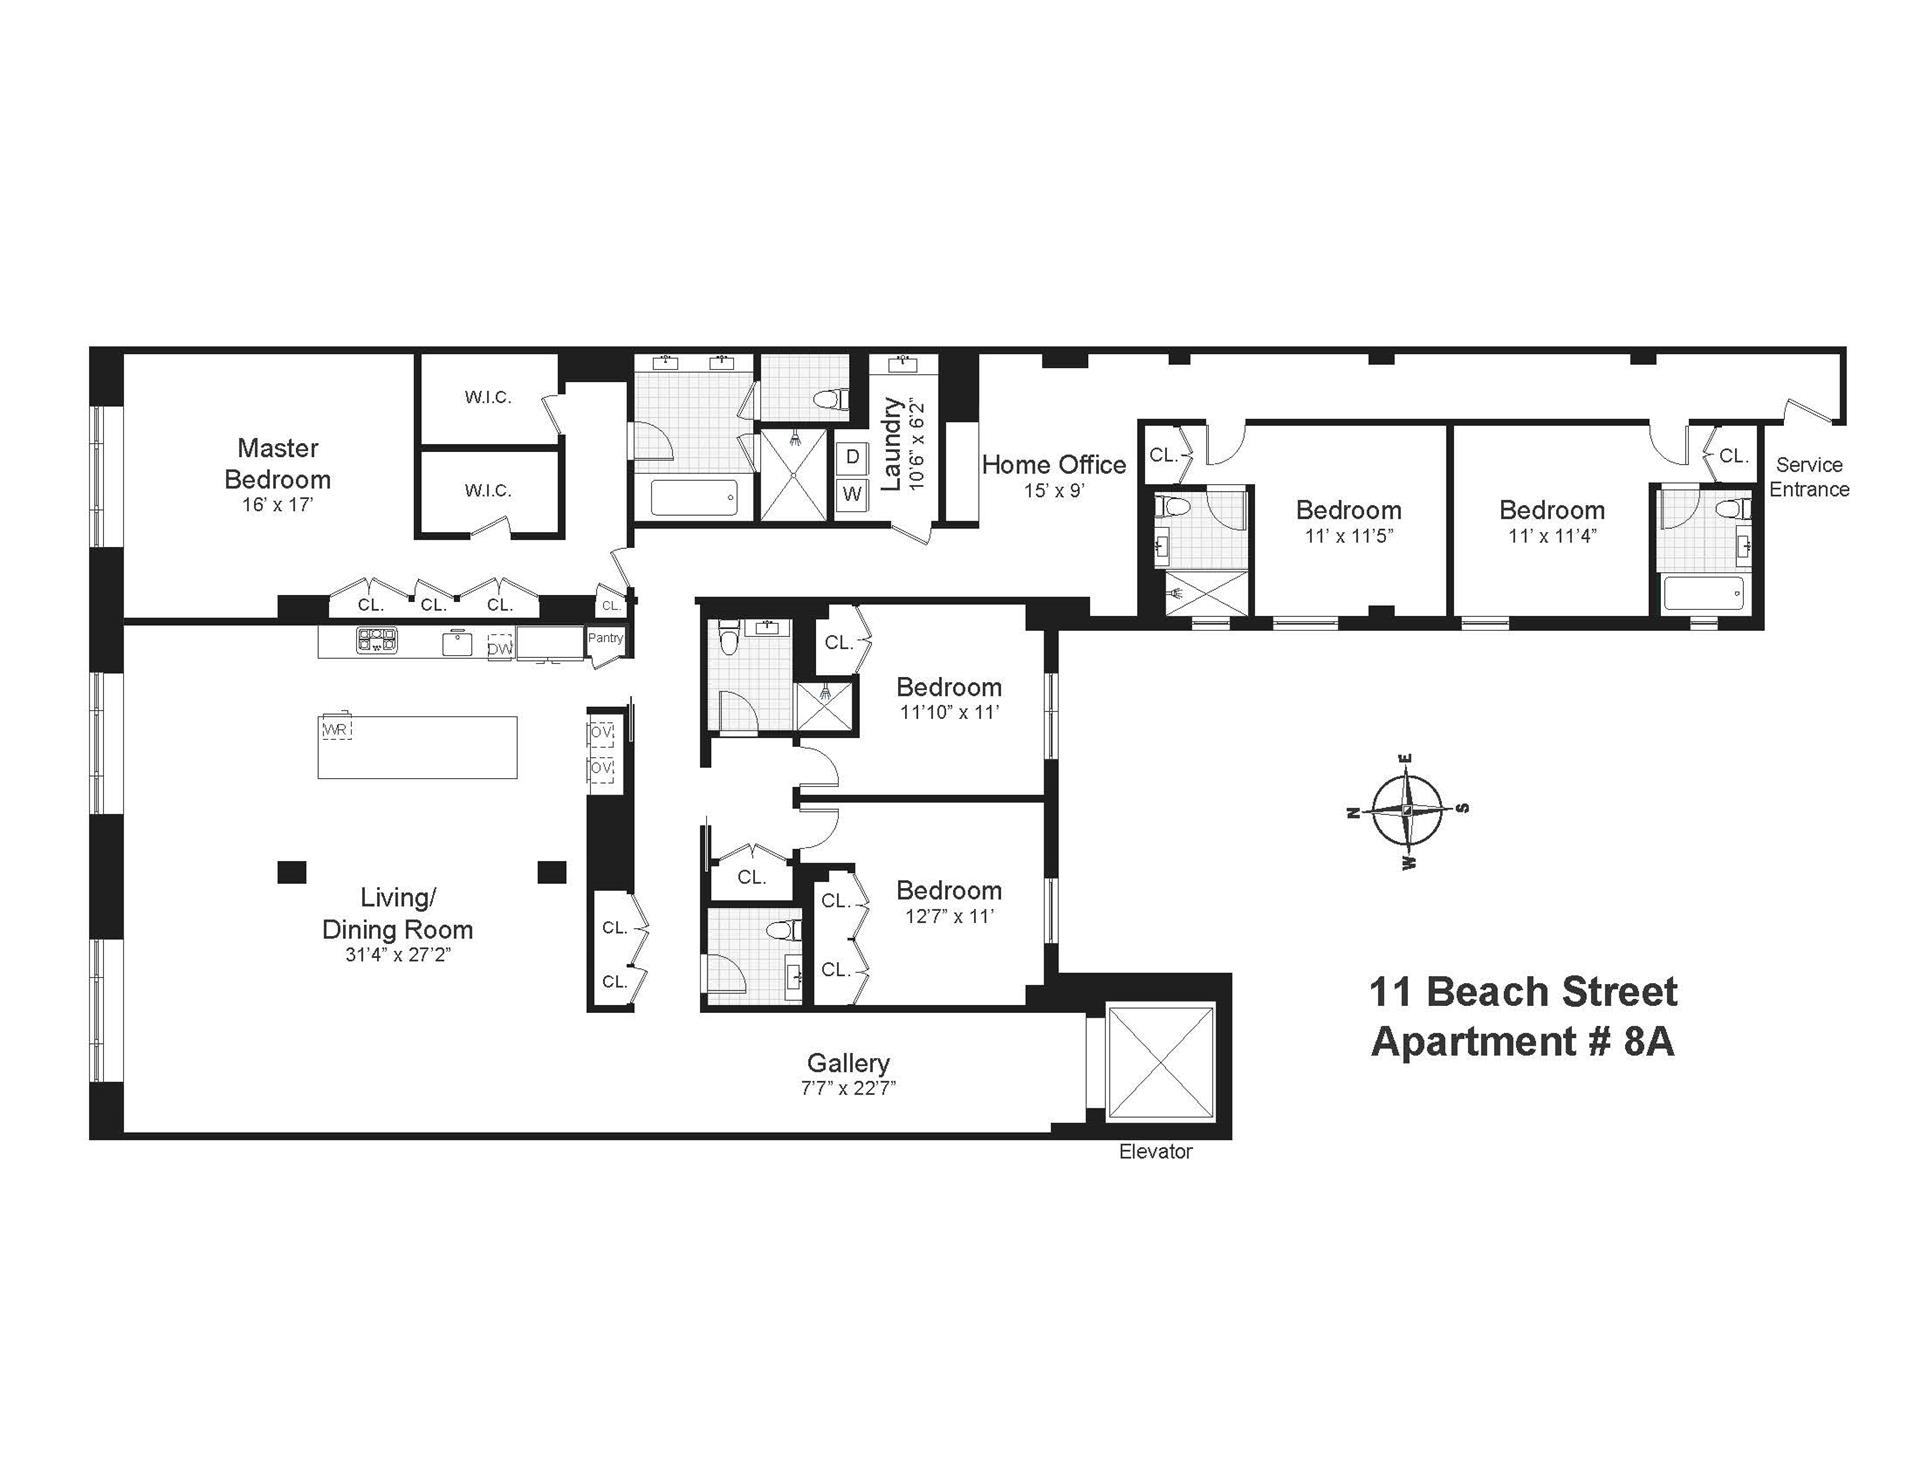 Floor plan of 11 Beach St, 8A - TriBeCa, New York